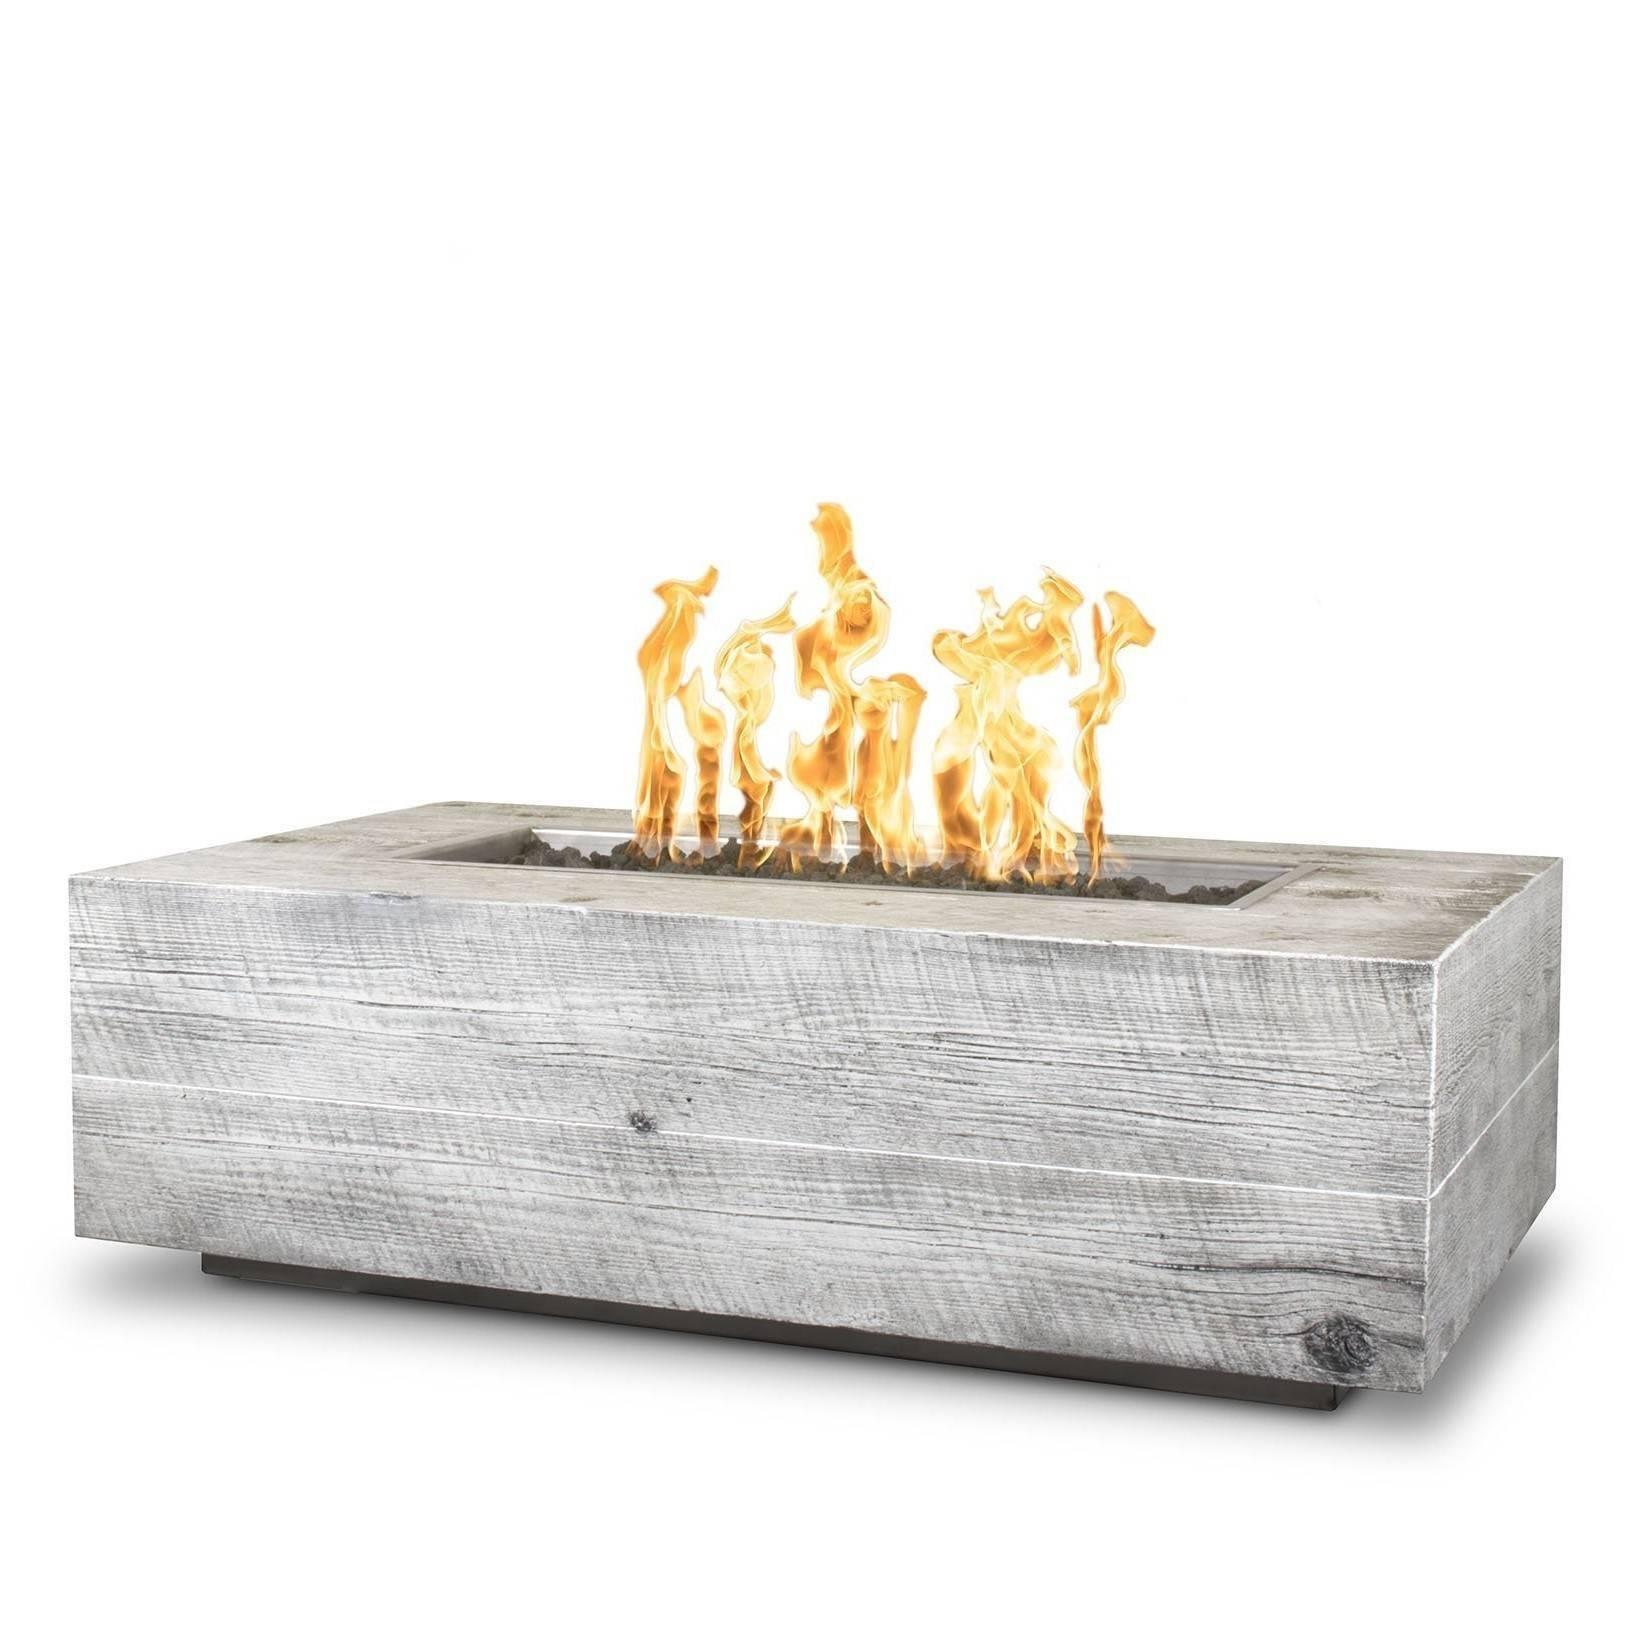 "48"" Coronado Wood Grain Concrete Fire Pit Table - Ivory"